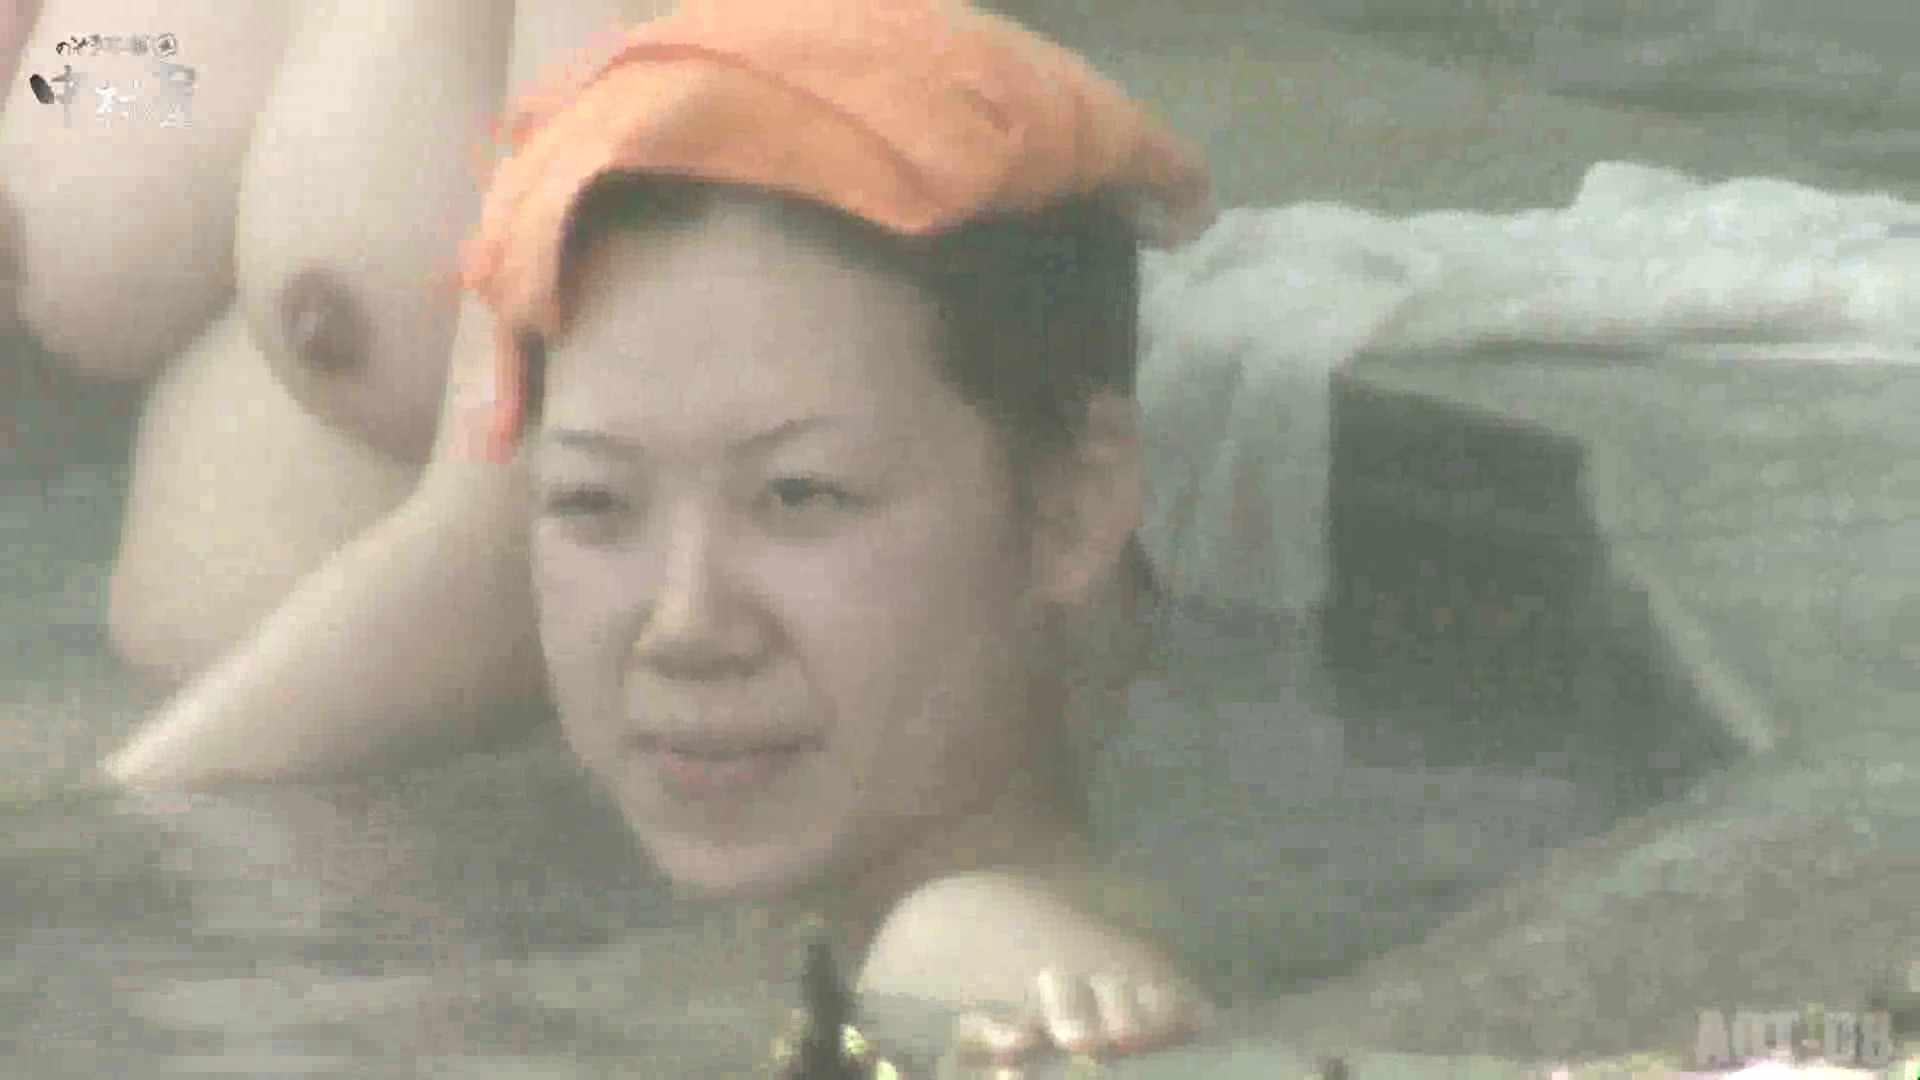 Aquaな露天風呂Vol.872潜入盗撮露天風呂八判湯 其の六 潜入 | 露天風呂  98連発 77